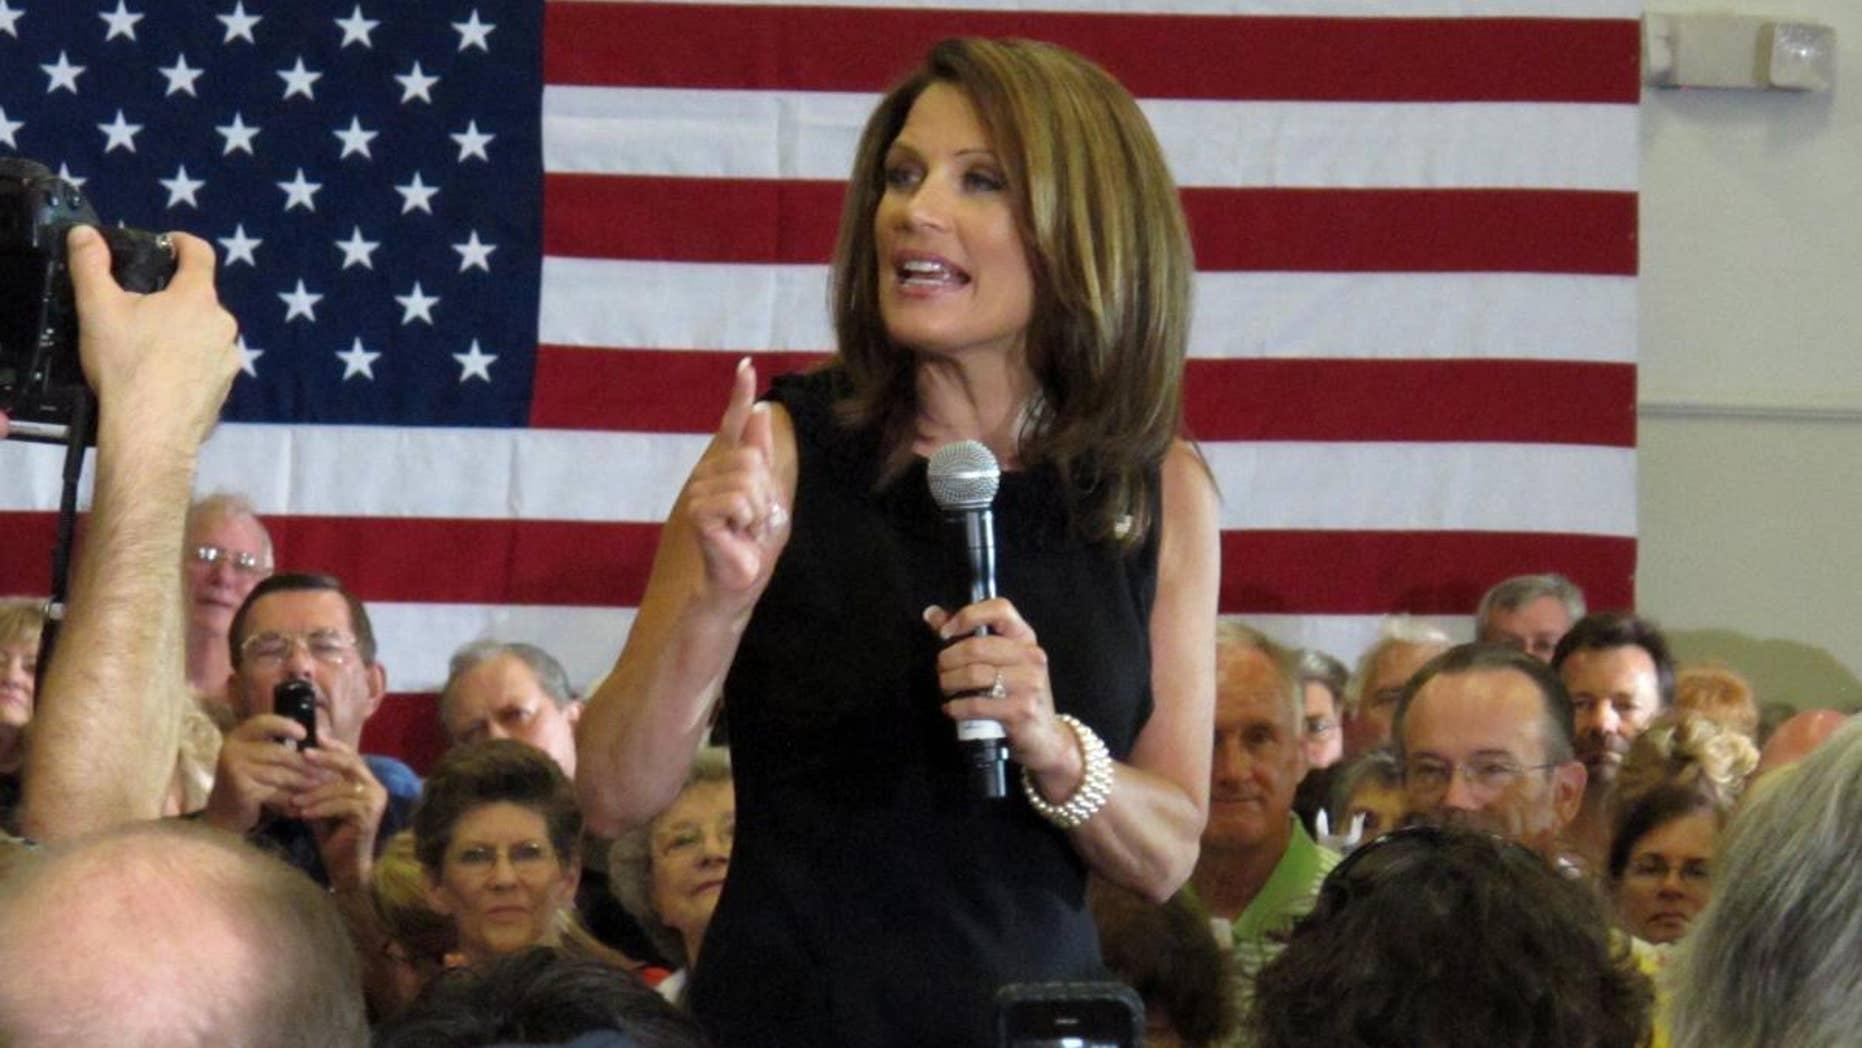 Republican presidential candidate Rep. Michele Bachmann, R-Minn., speaks during a Sunday, Aug. 28, 2011, rally in Sarasota, Fla. (AP Photo/Brendan Farrington)